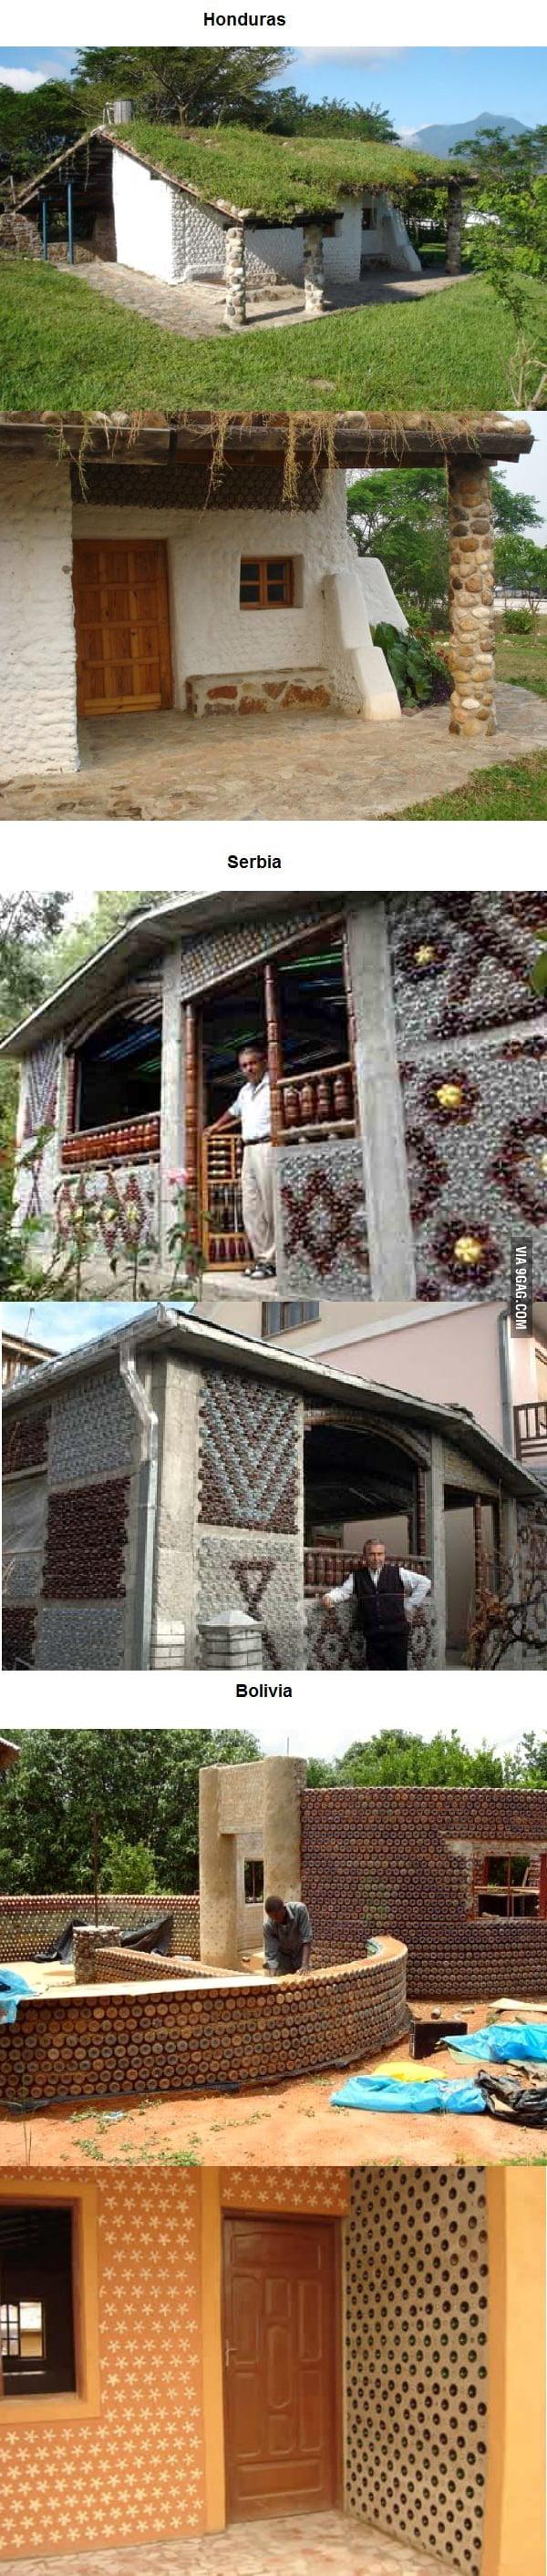 Amazing houses made of plastics bottles